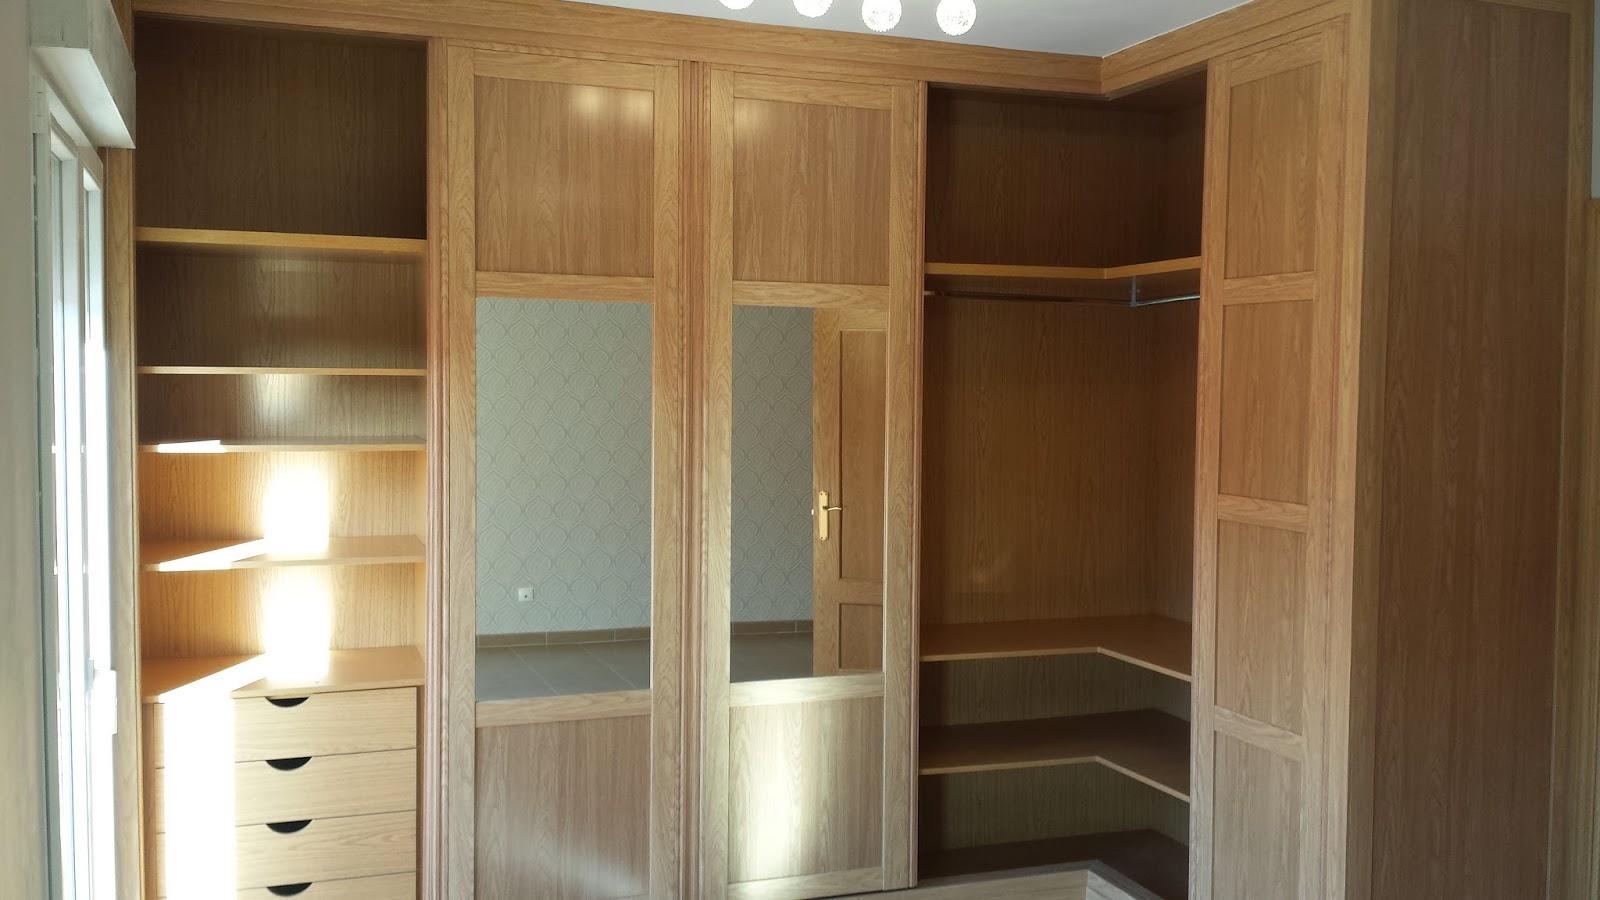 Muebles anser f brica de muebles baratos en madrid for Muebles baratos madrid